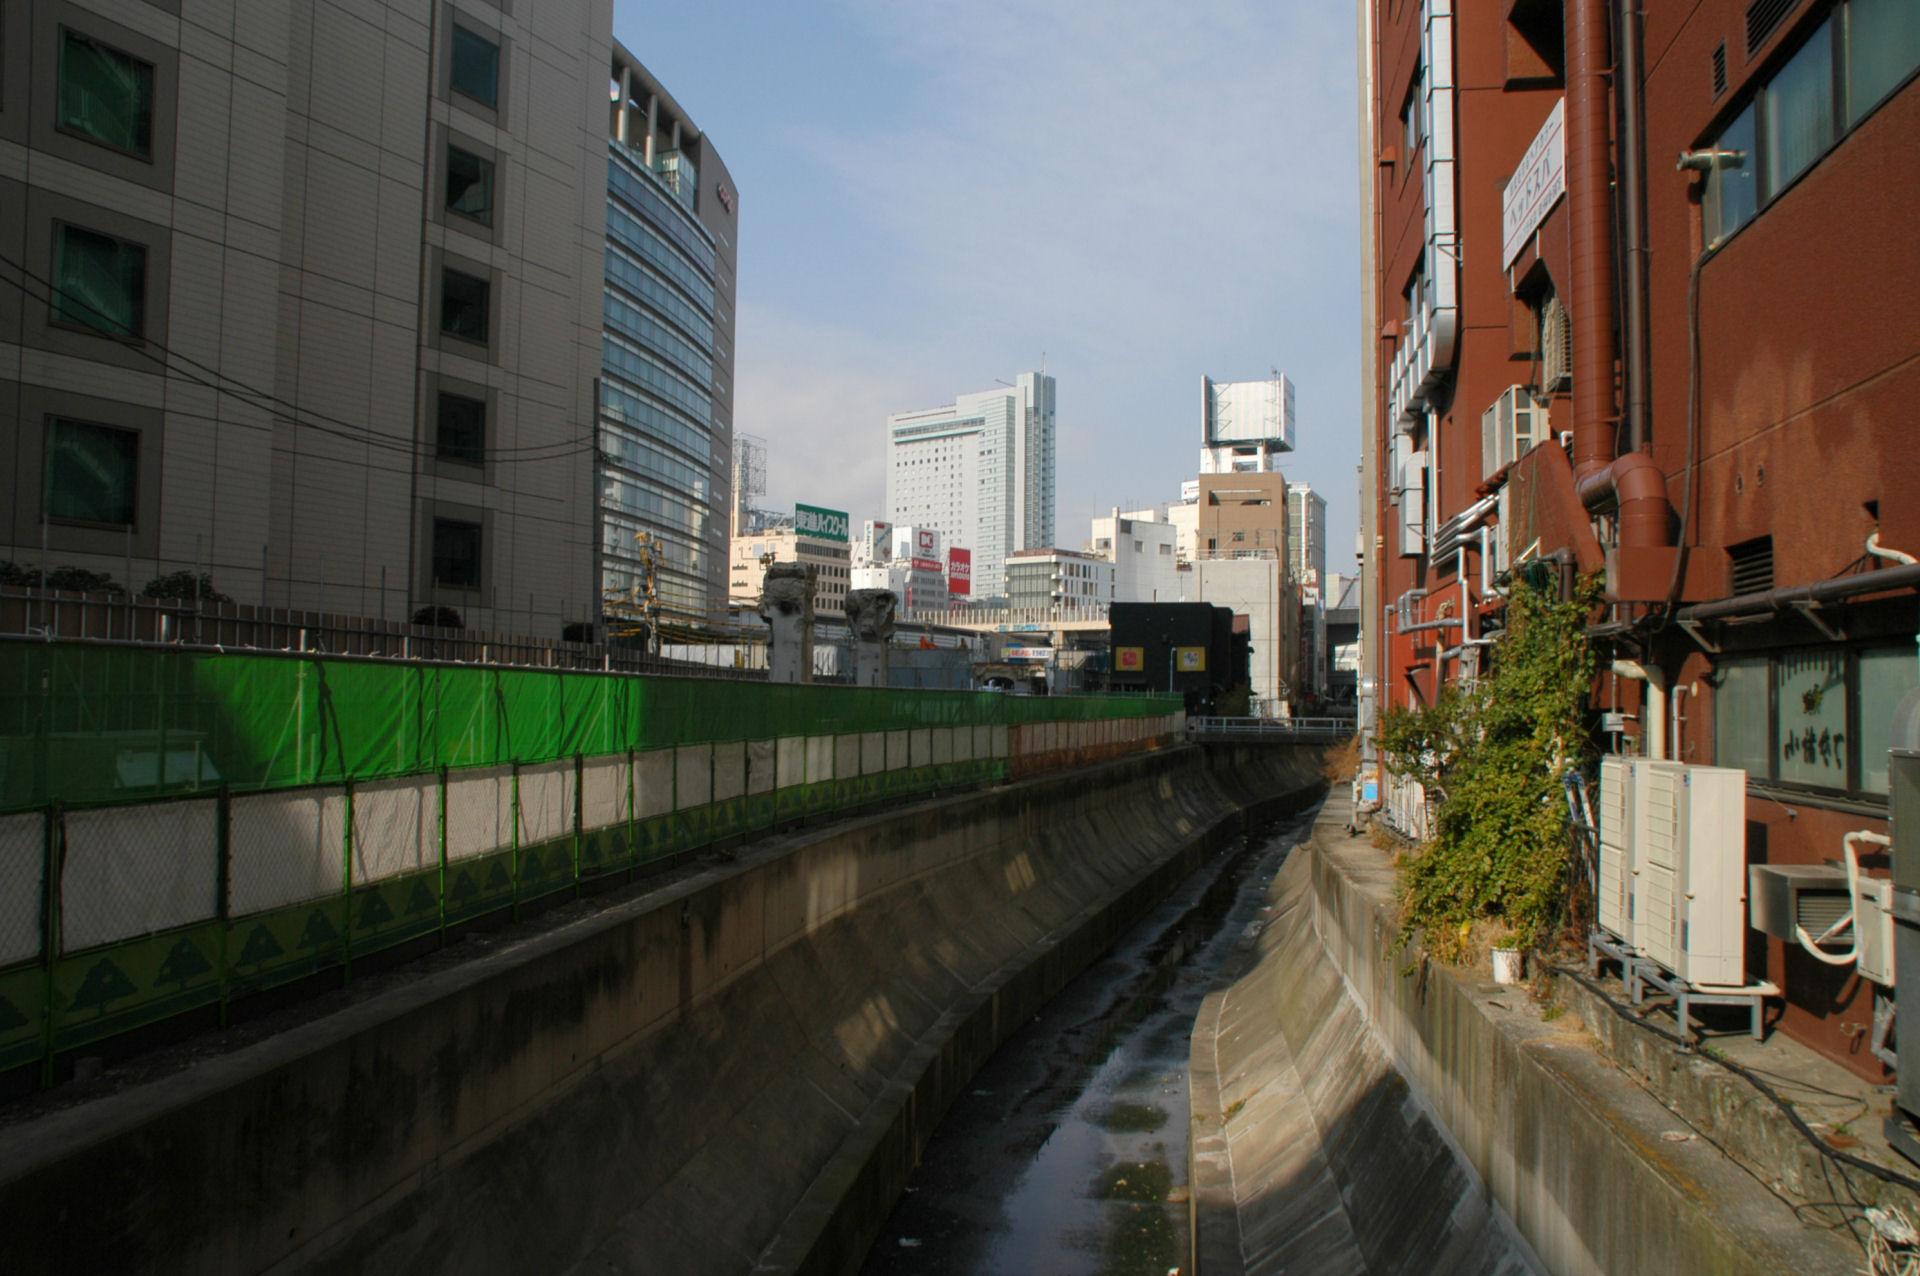 shibusou14020019.jpg